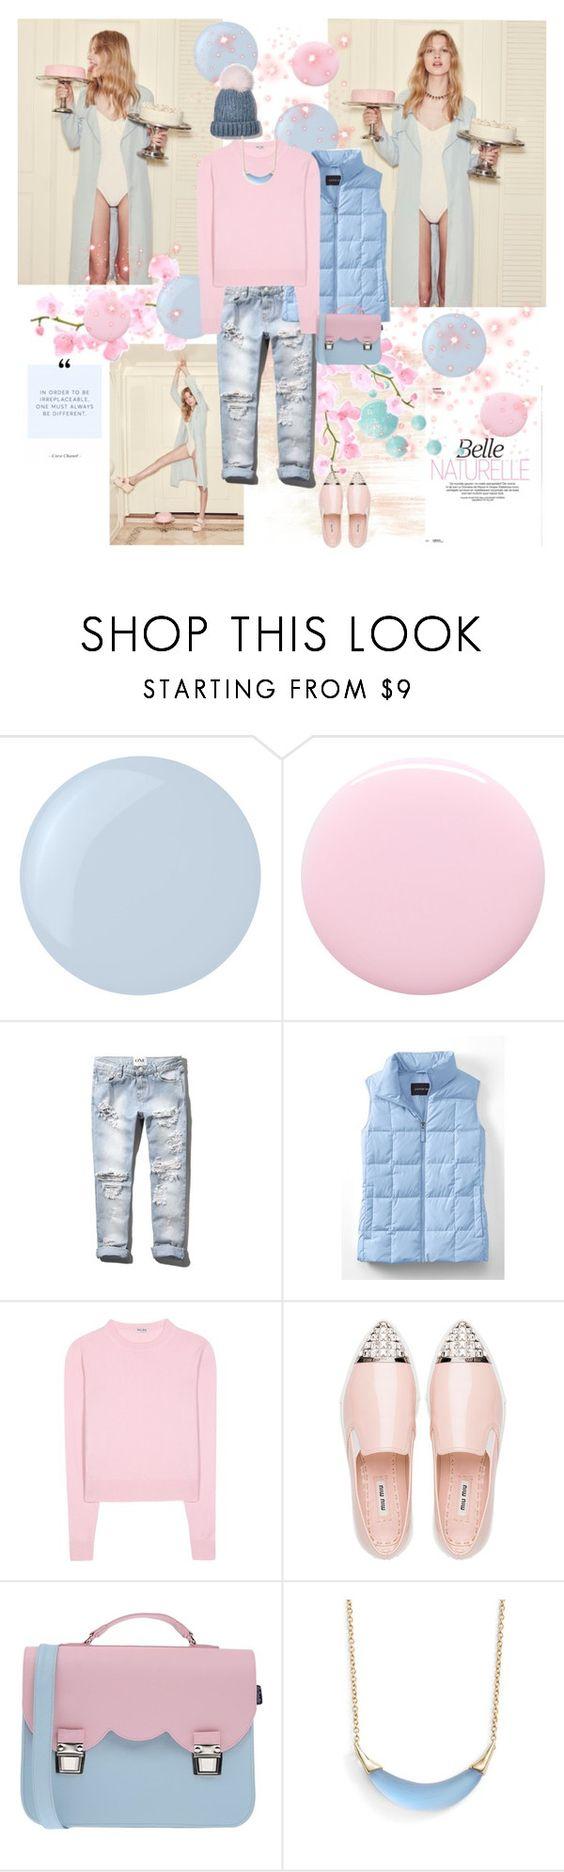 """Pantone 2016"" by jenuarik ❤ liked on Polyvore featuring BB Dakota, Essie, Nails Inc., Abercrombie & Fitch, Lands' End, Miu Miu, La Cartella, Alexis Bittar, women's clothing and women's fashion"